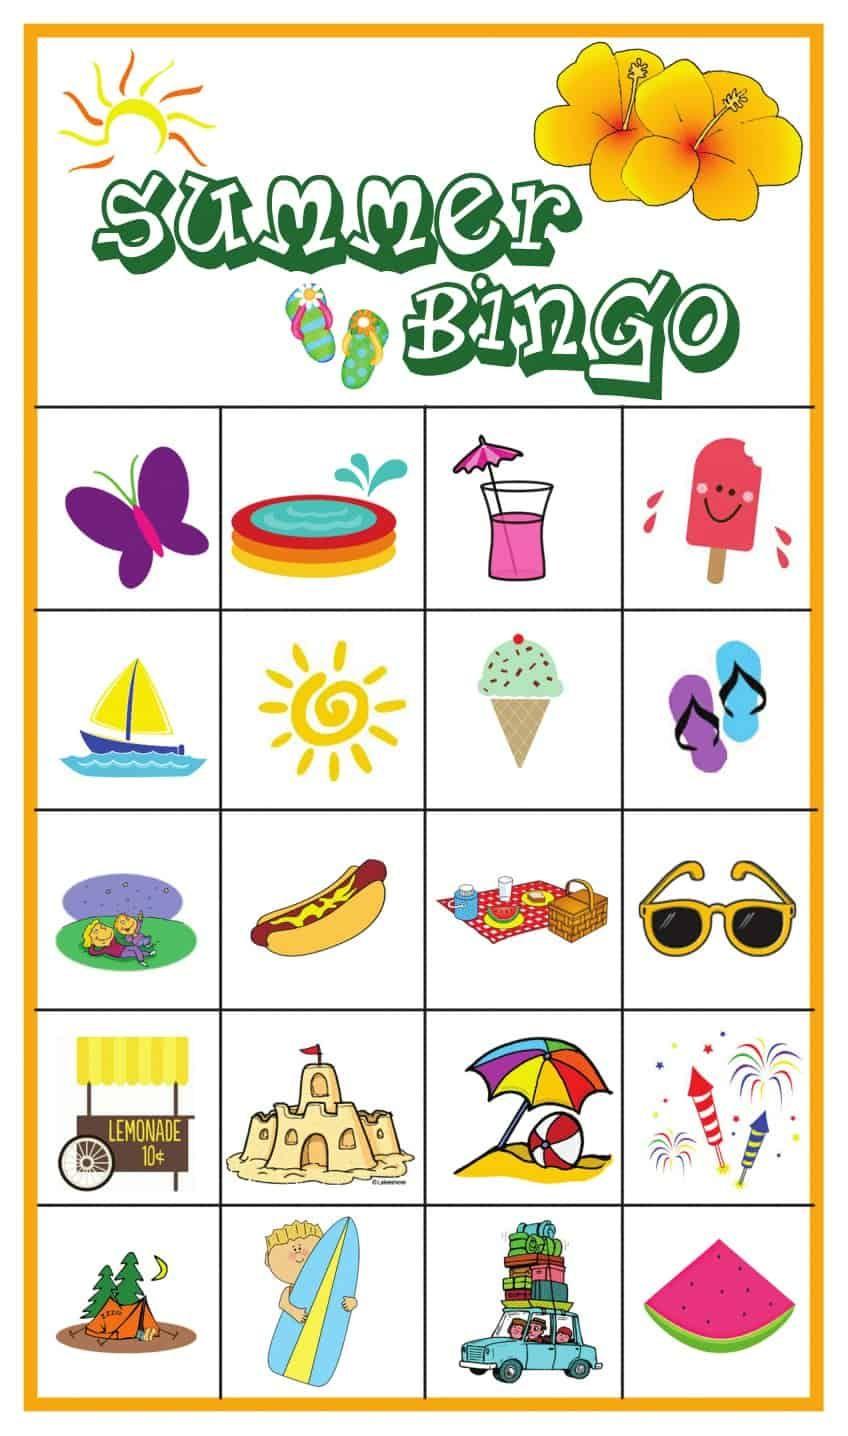 Summer Bingo Game With Free Printables | Bingo Games, Bingo